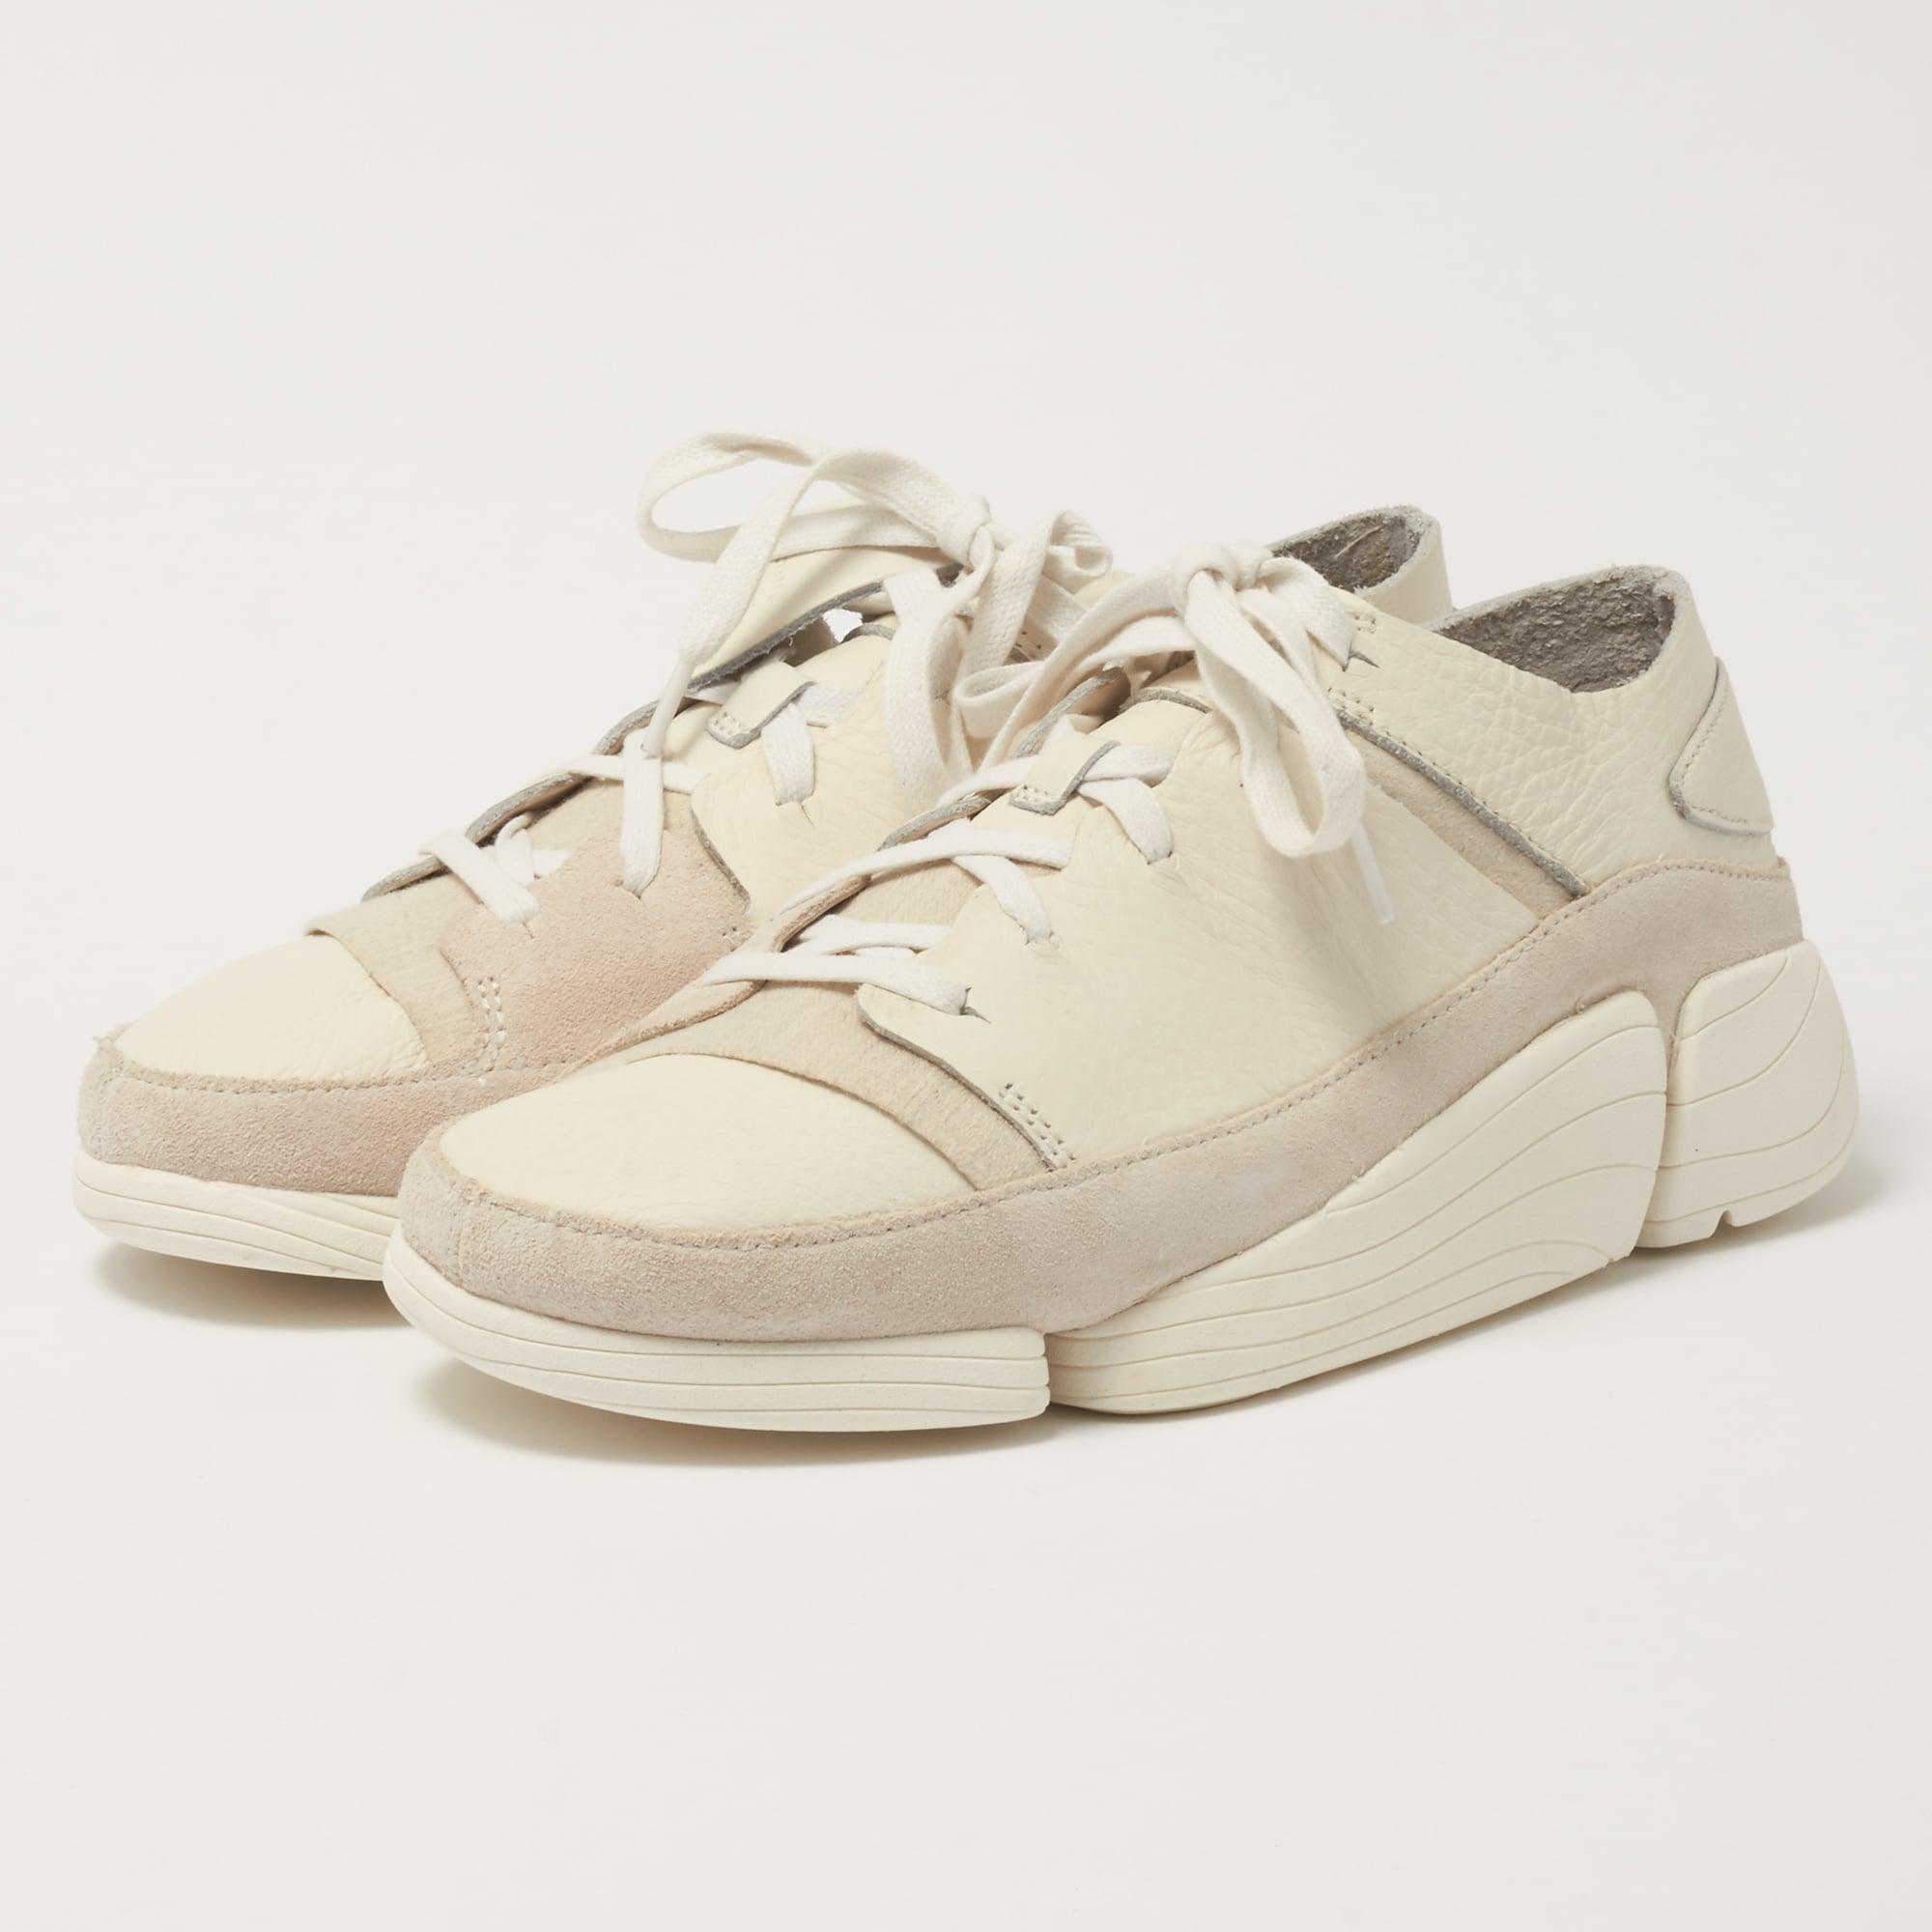 Clarks Originals Trigenic Evo Shoes White Leather